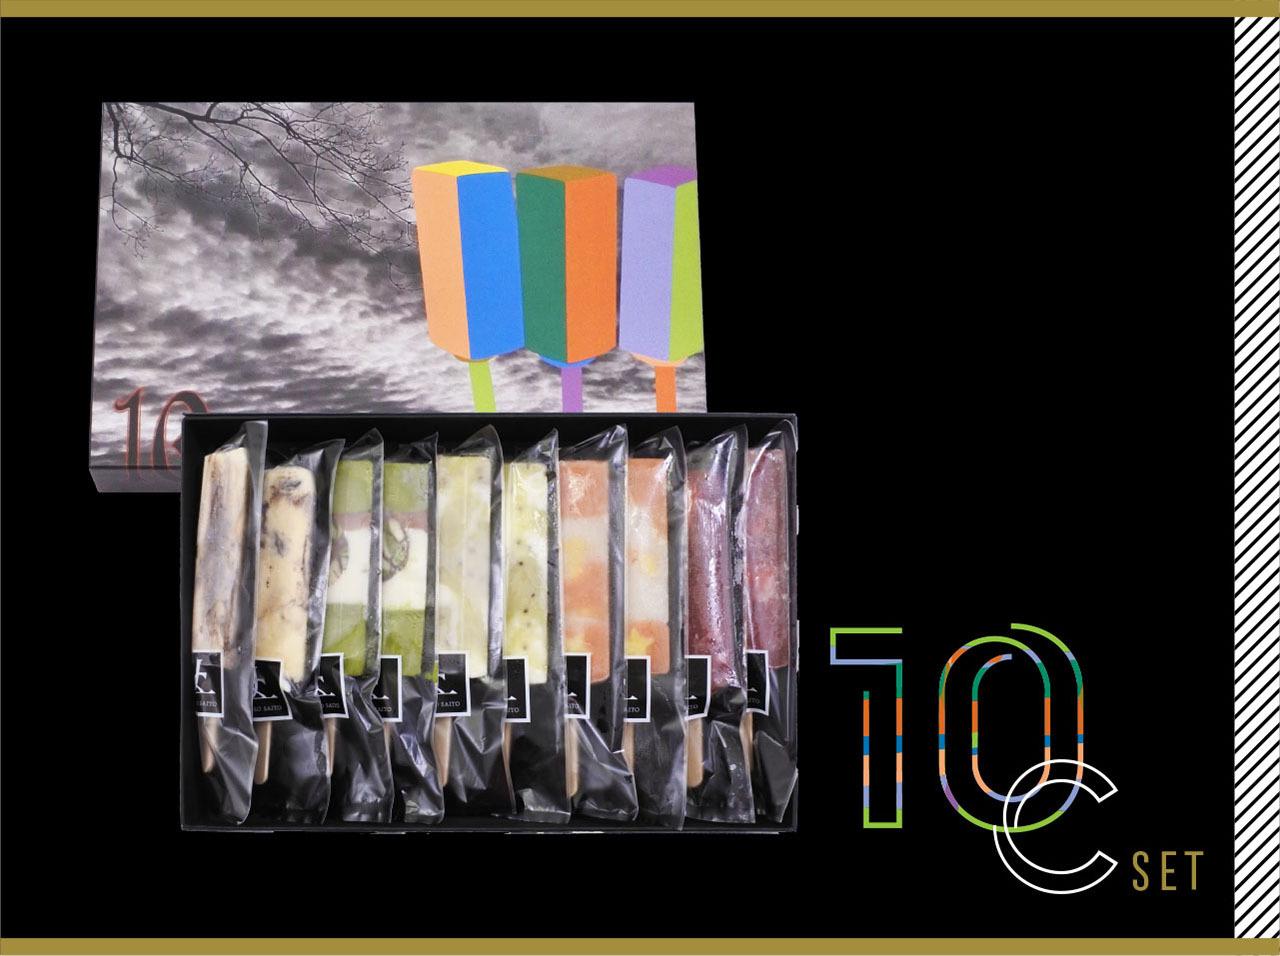 JOTAROアイスバー 5種 10本入Cセット